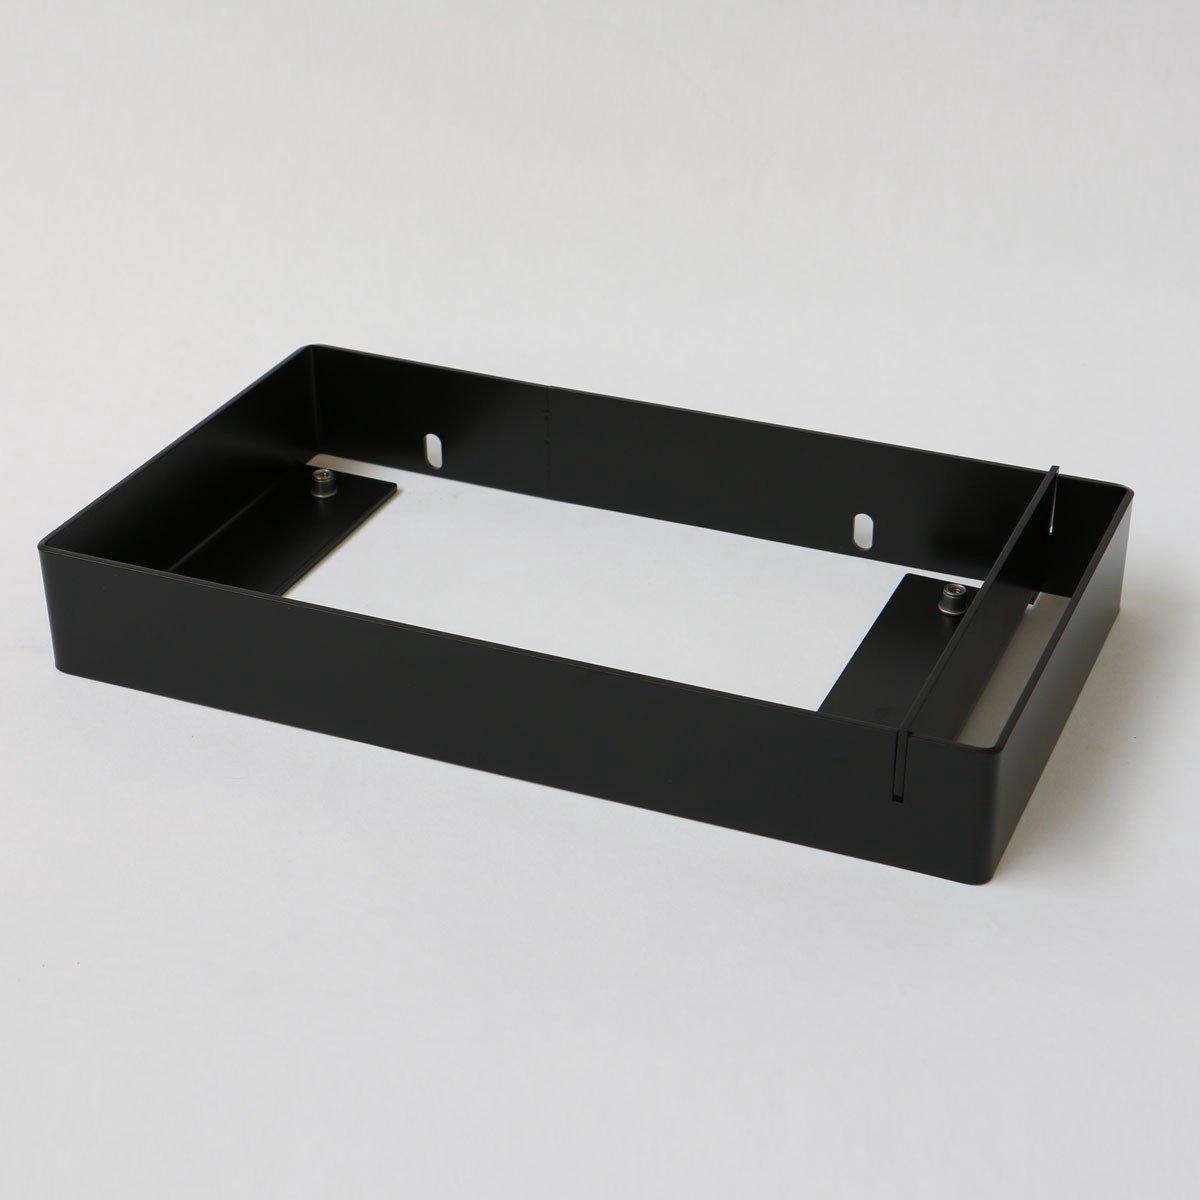 INK Jazz XS fonteinframe staal, handdoekhouder rechts, 360x50x200 mm, mat zwart